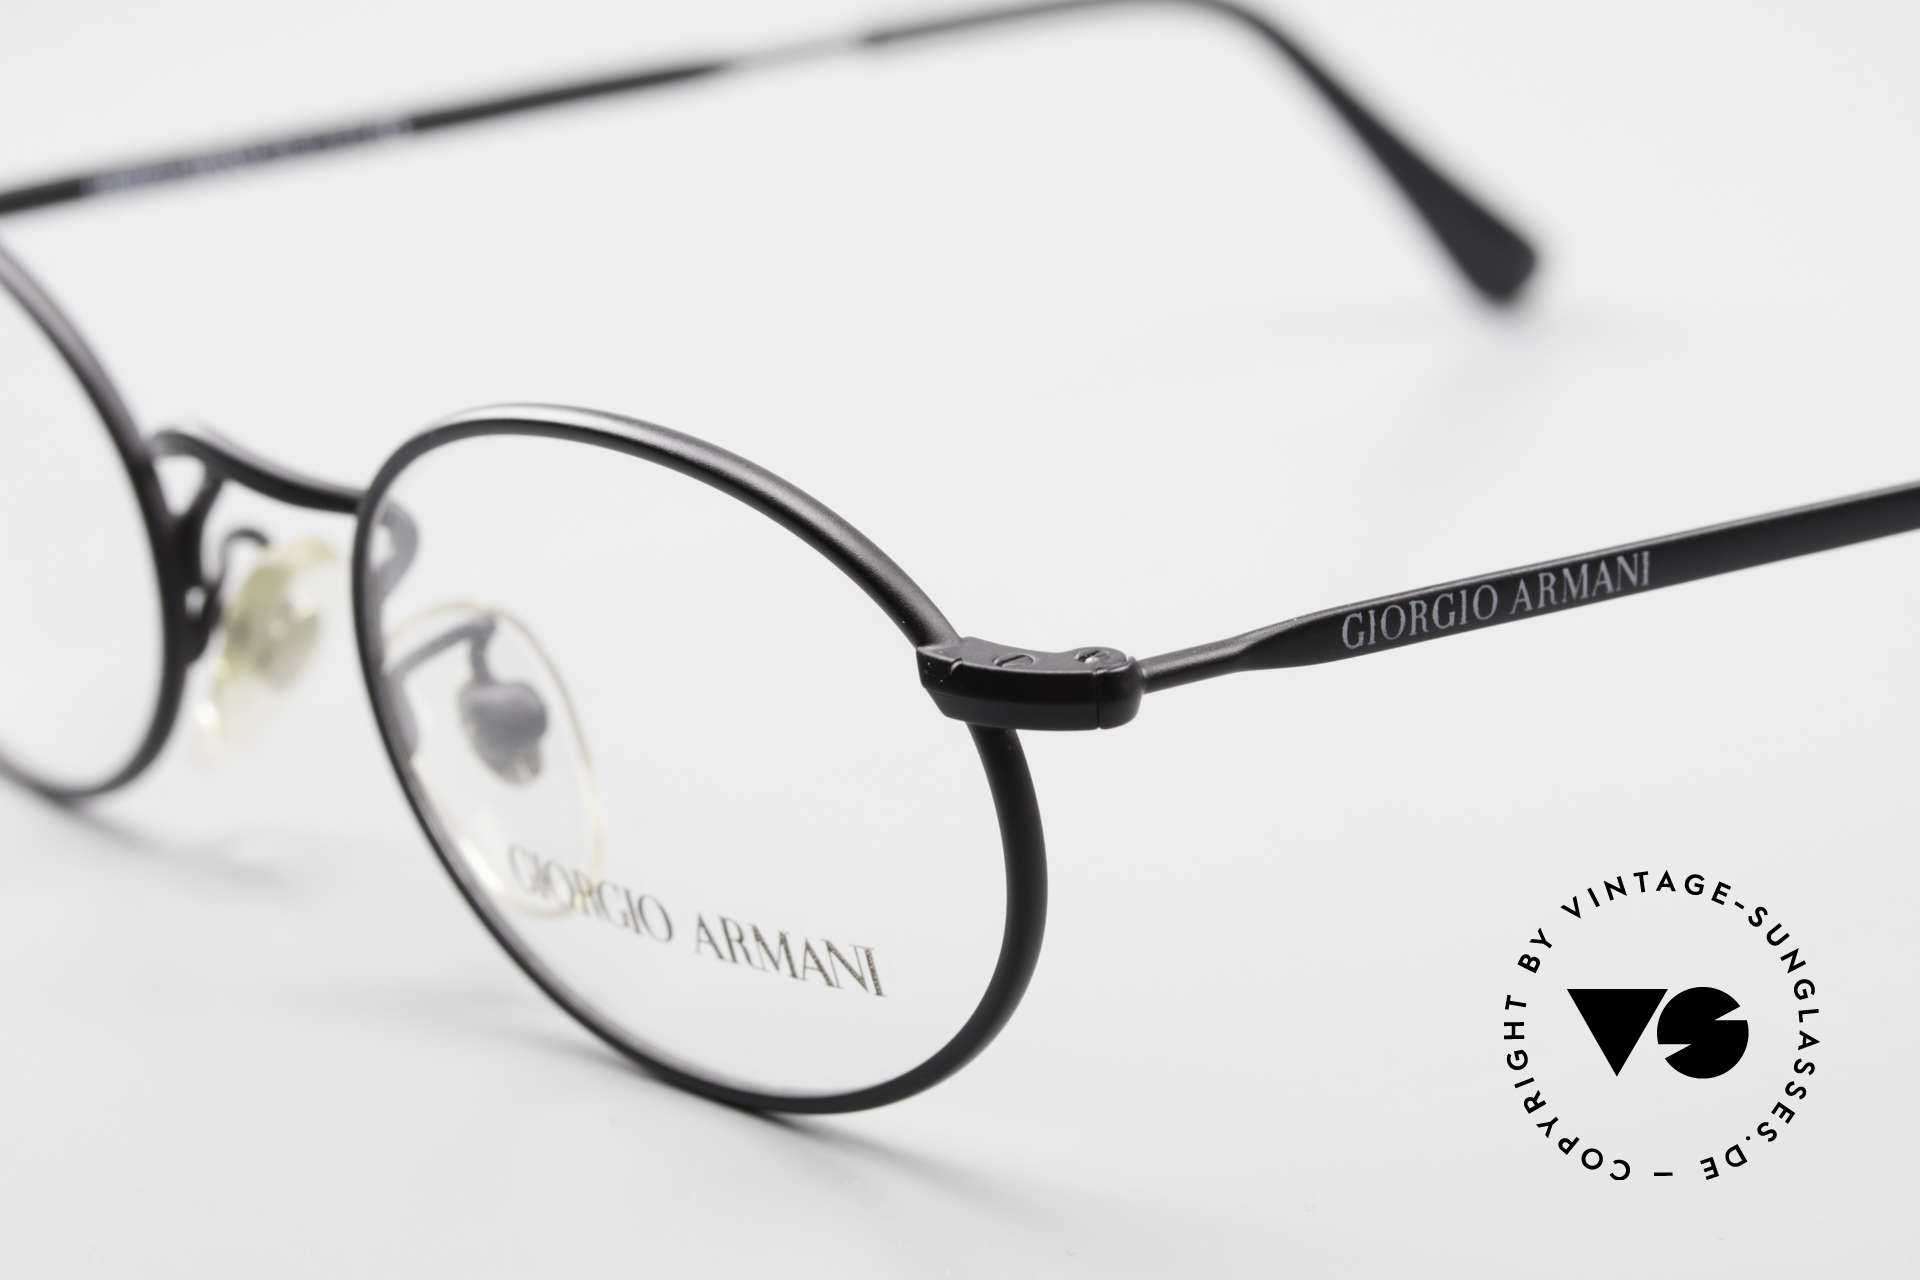 Giorgio Armani 131 Vintage Eyeglasses Oval Frame, never worn (like all our rare vintage Armani glasses), Made for Men and Women